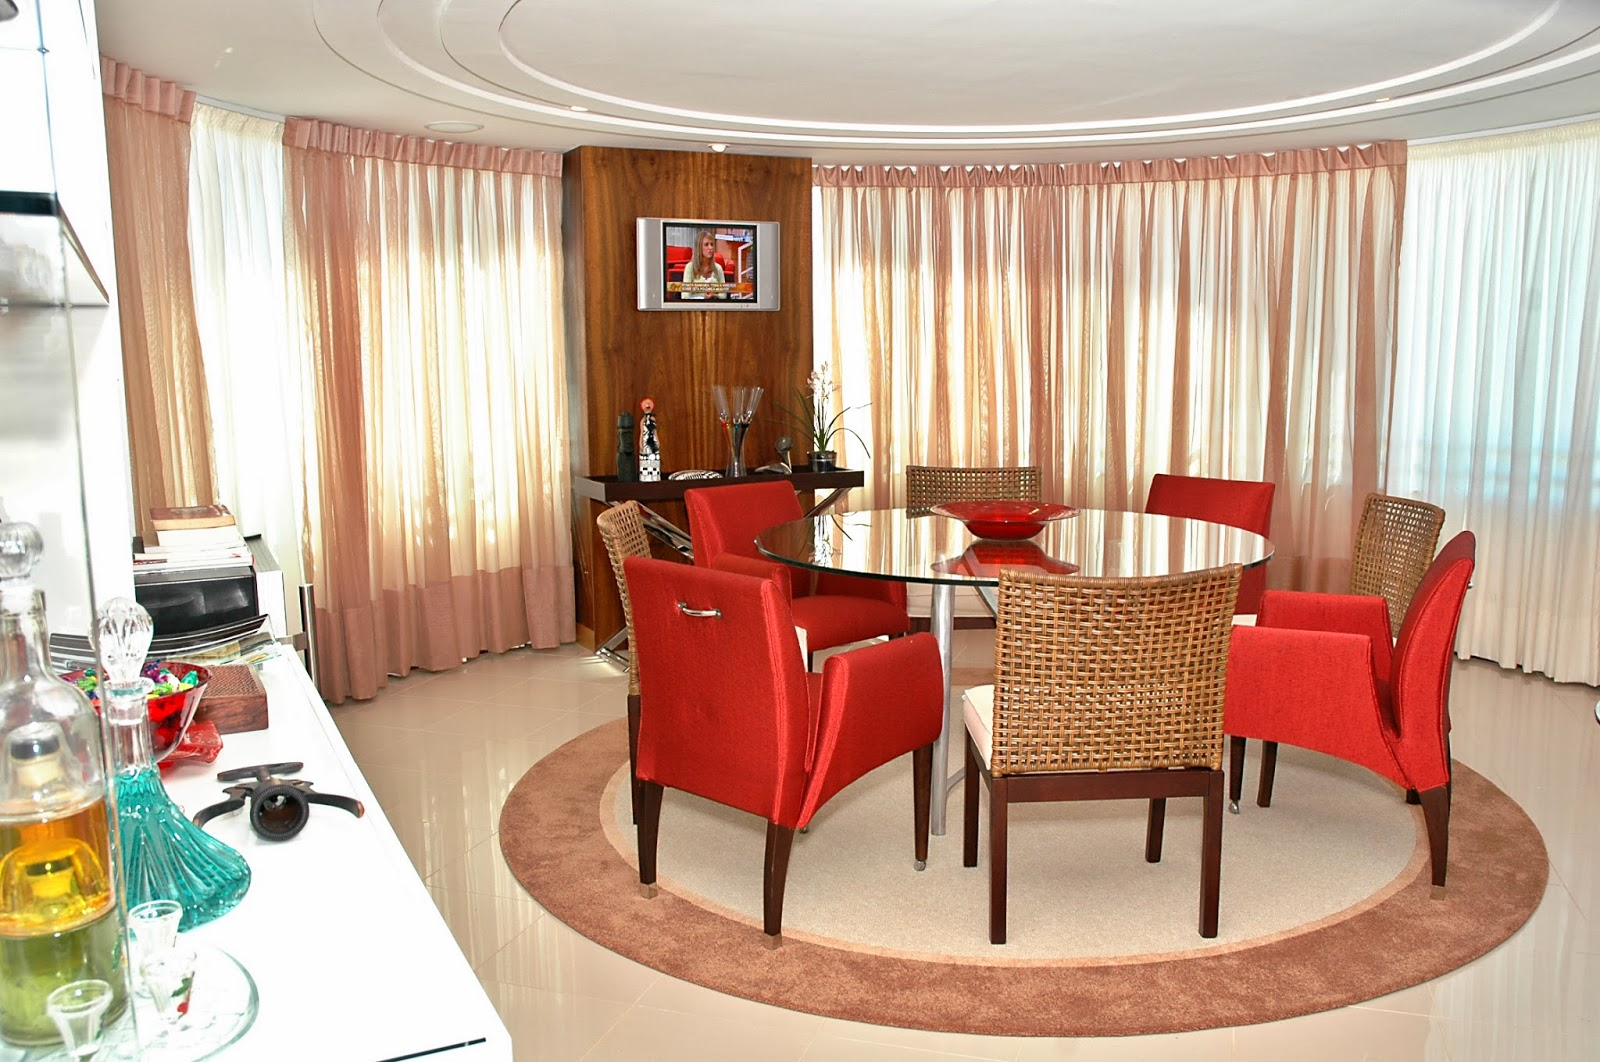 Papo Arq&Decor: Sala de Jantar #AE261D 1600x1062